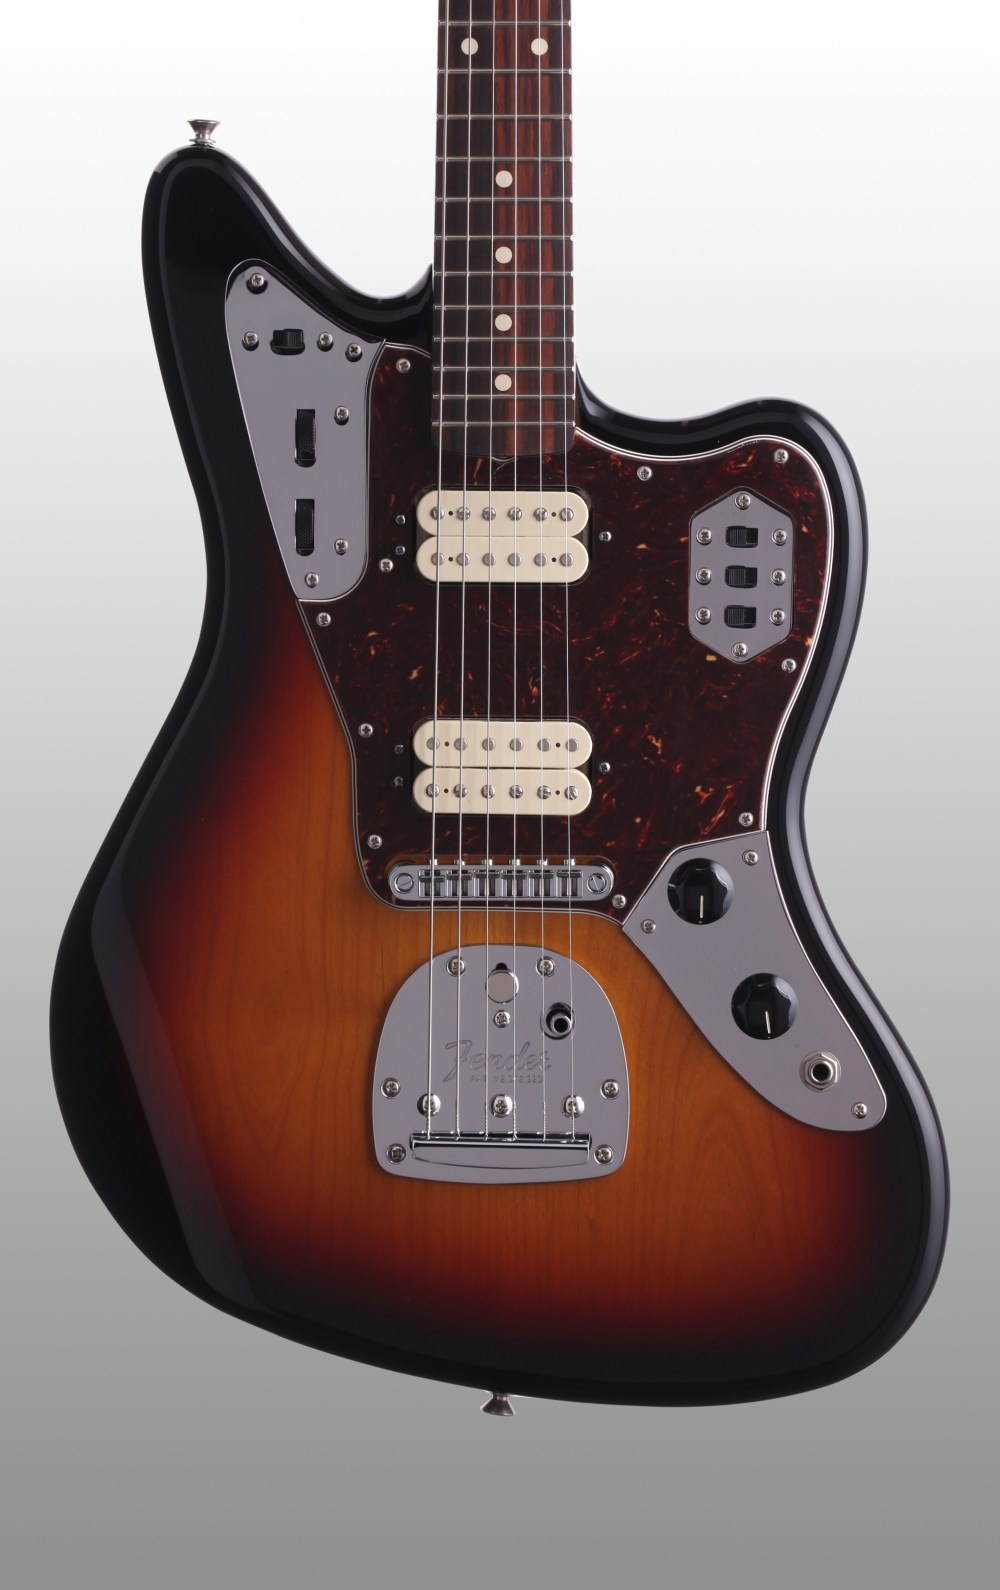 medium resolution of fender jaguar guitar wiring diagram in addition dishwasher air gap 6635d1350101660110ccbasicwiringsetup5wirelifanwiring041605